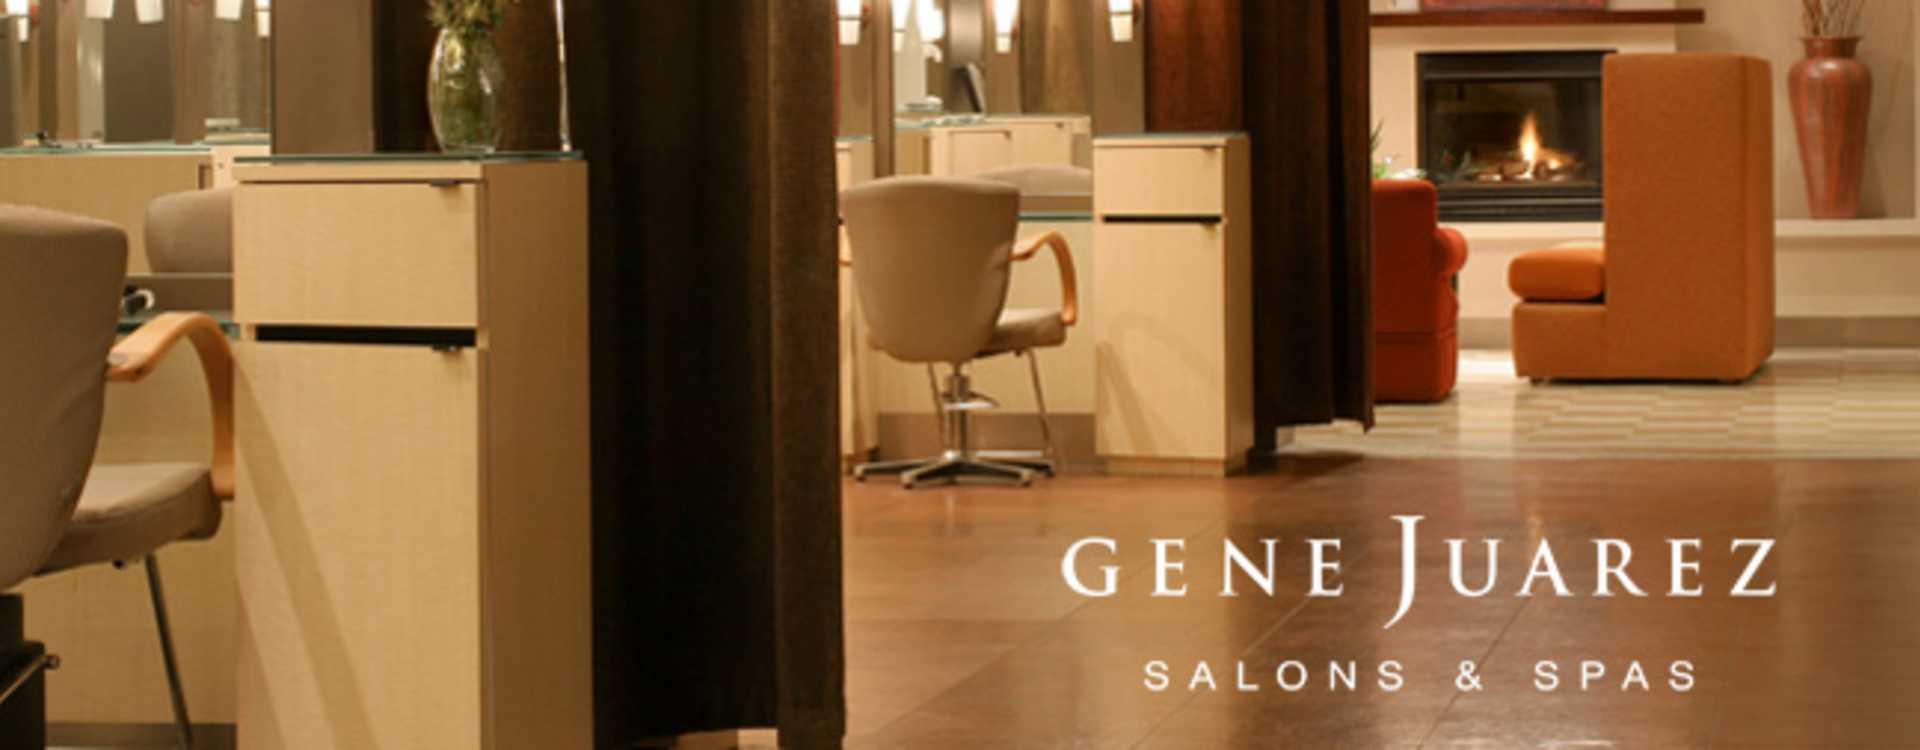 Gene_Juarez_Salon___Spa.jpg